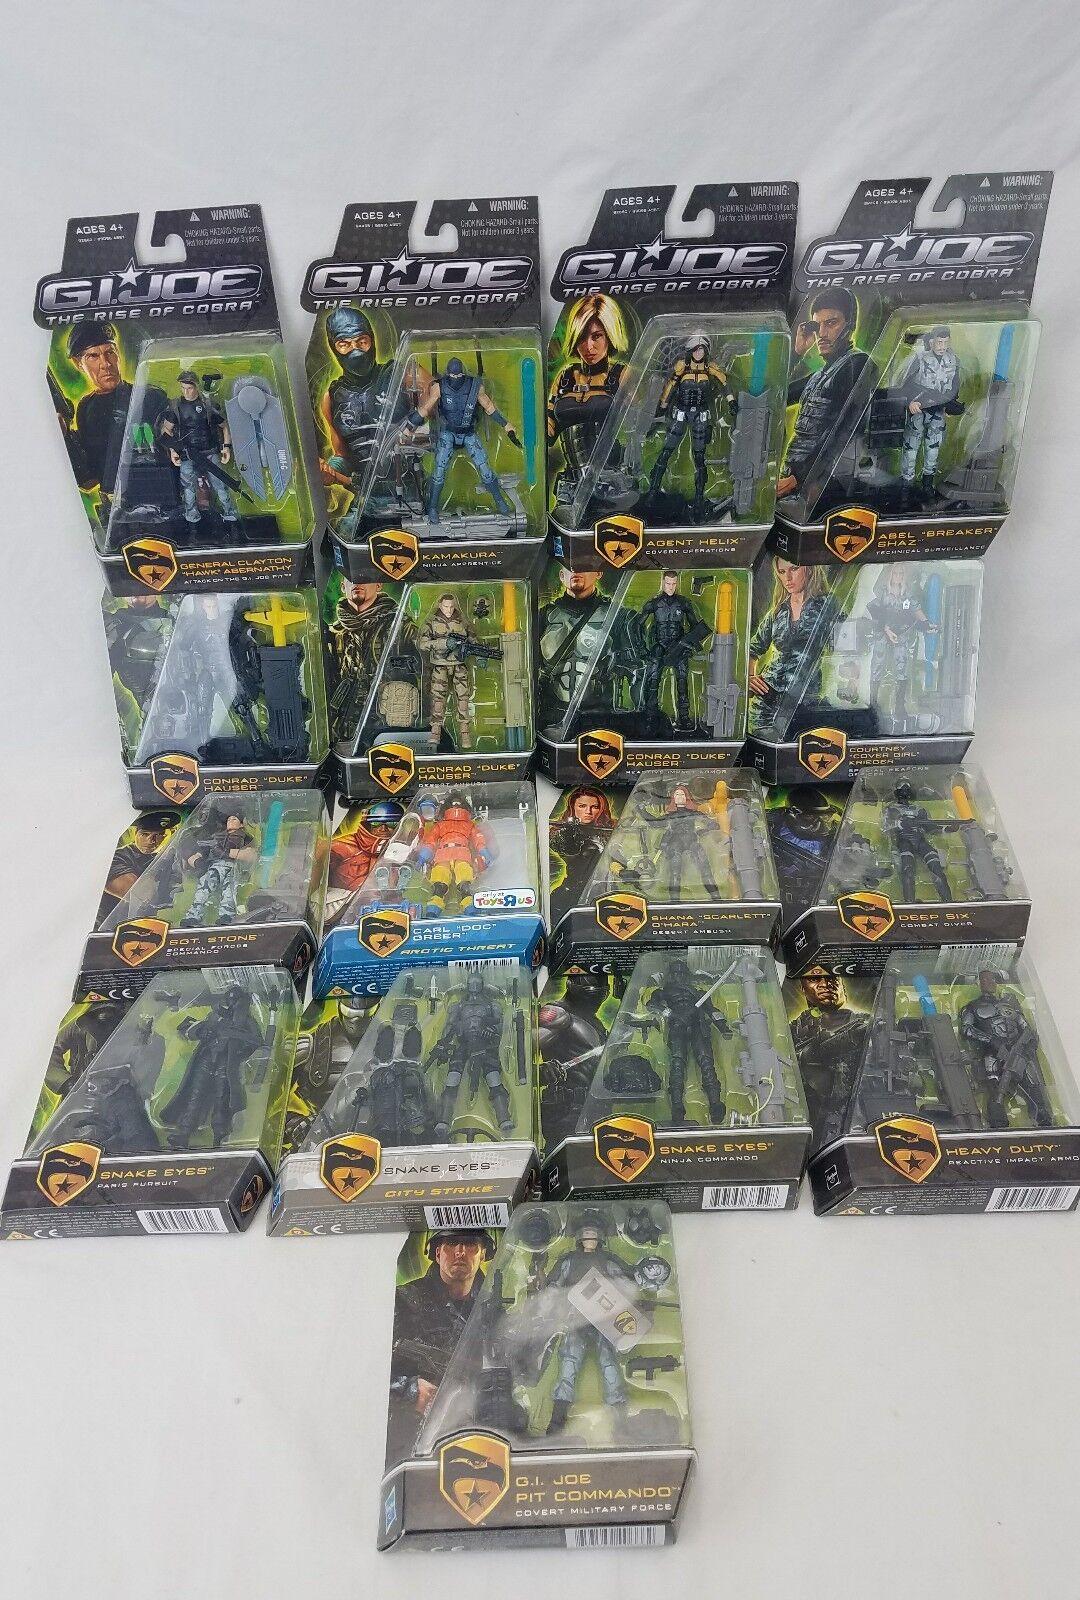 G.I. Joe Rise of Cobra Hasbro Action Figures Collection Lot de 17 film